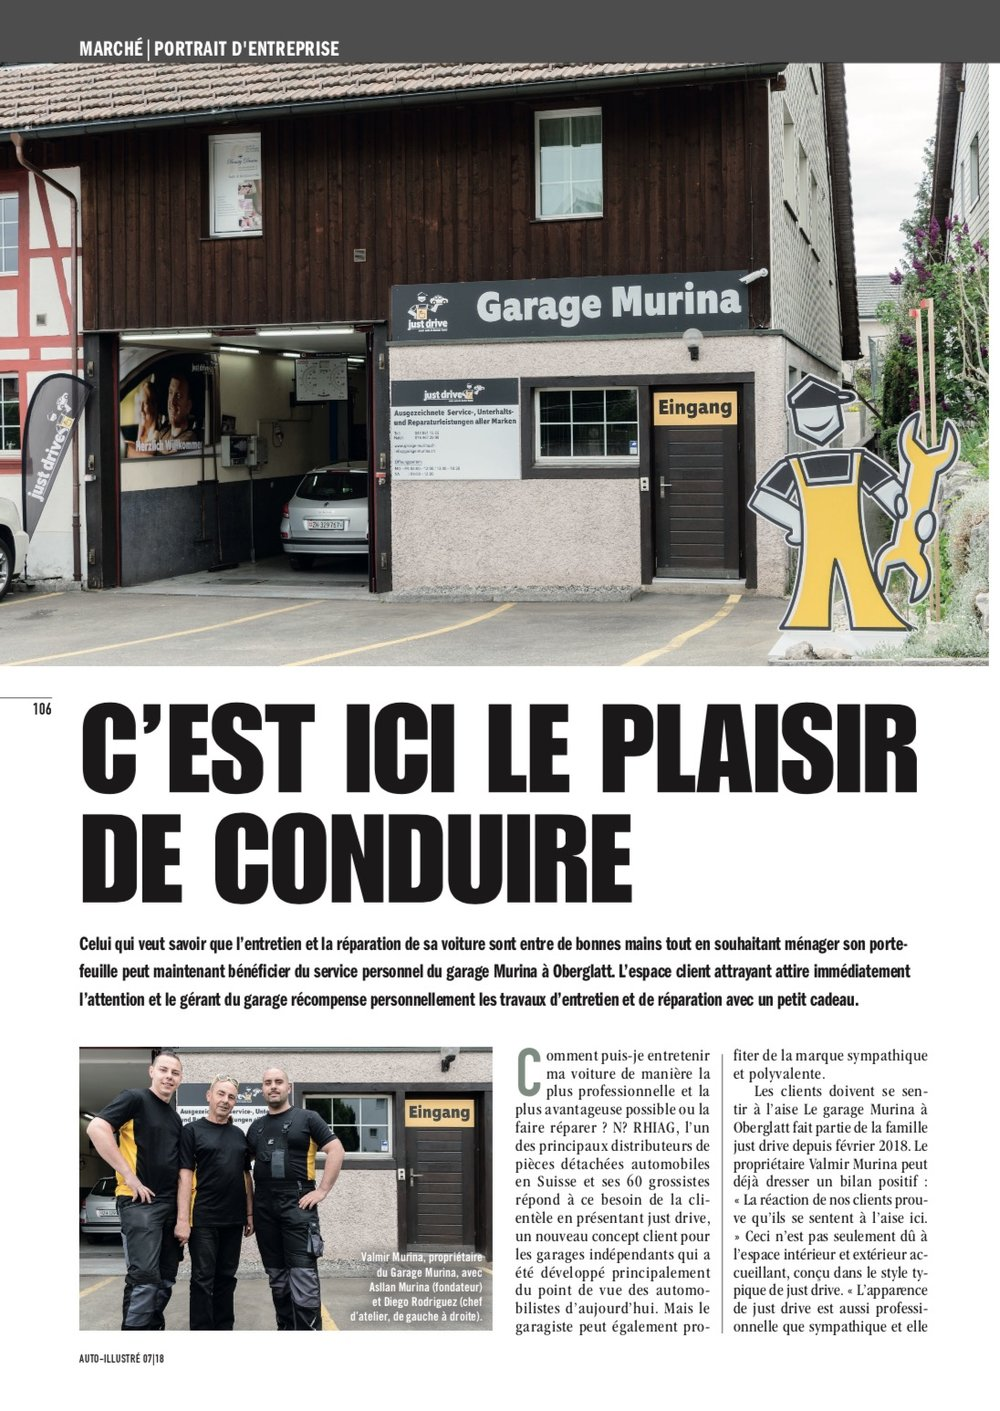 just-drive-Auto-Illustrierte_07-18-FR.jpg